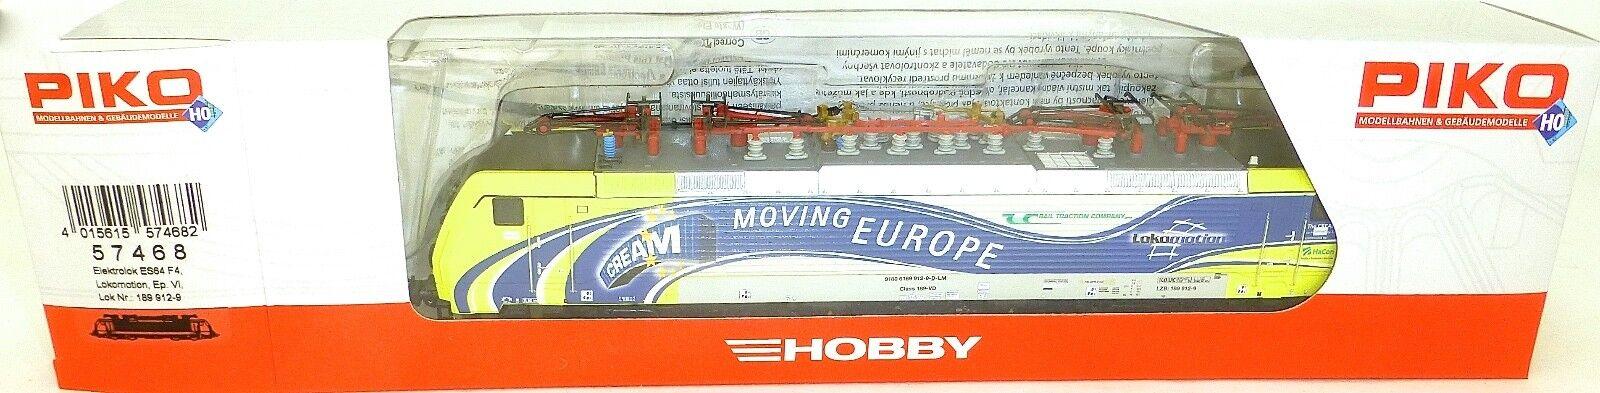 Es 64 F4 Lokomotion Cream Ellok 189 912-9 Epvi Piko 57468 H0 1 87 Neuf et